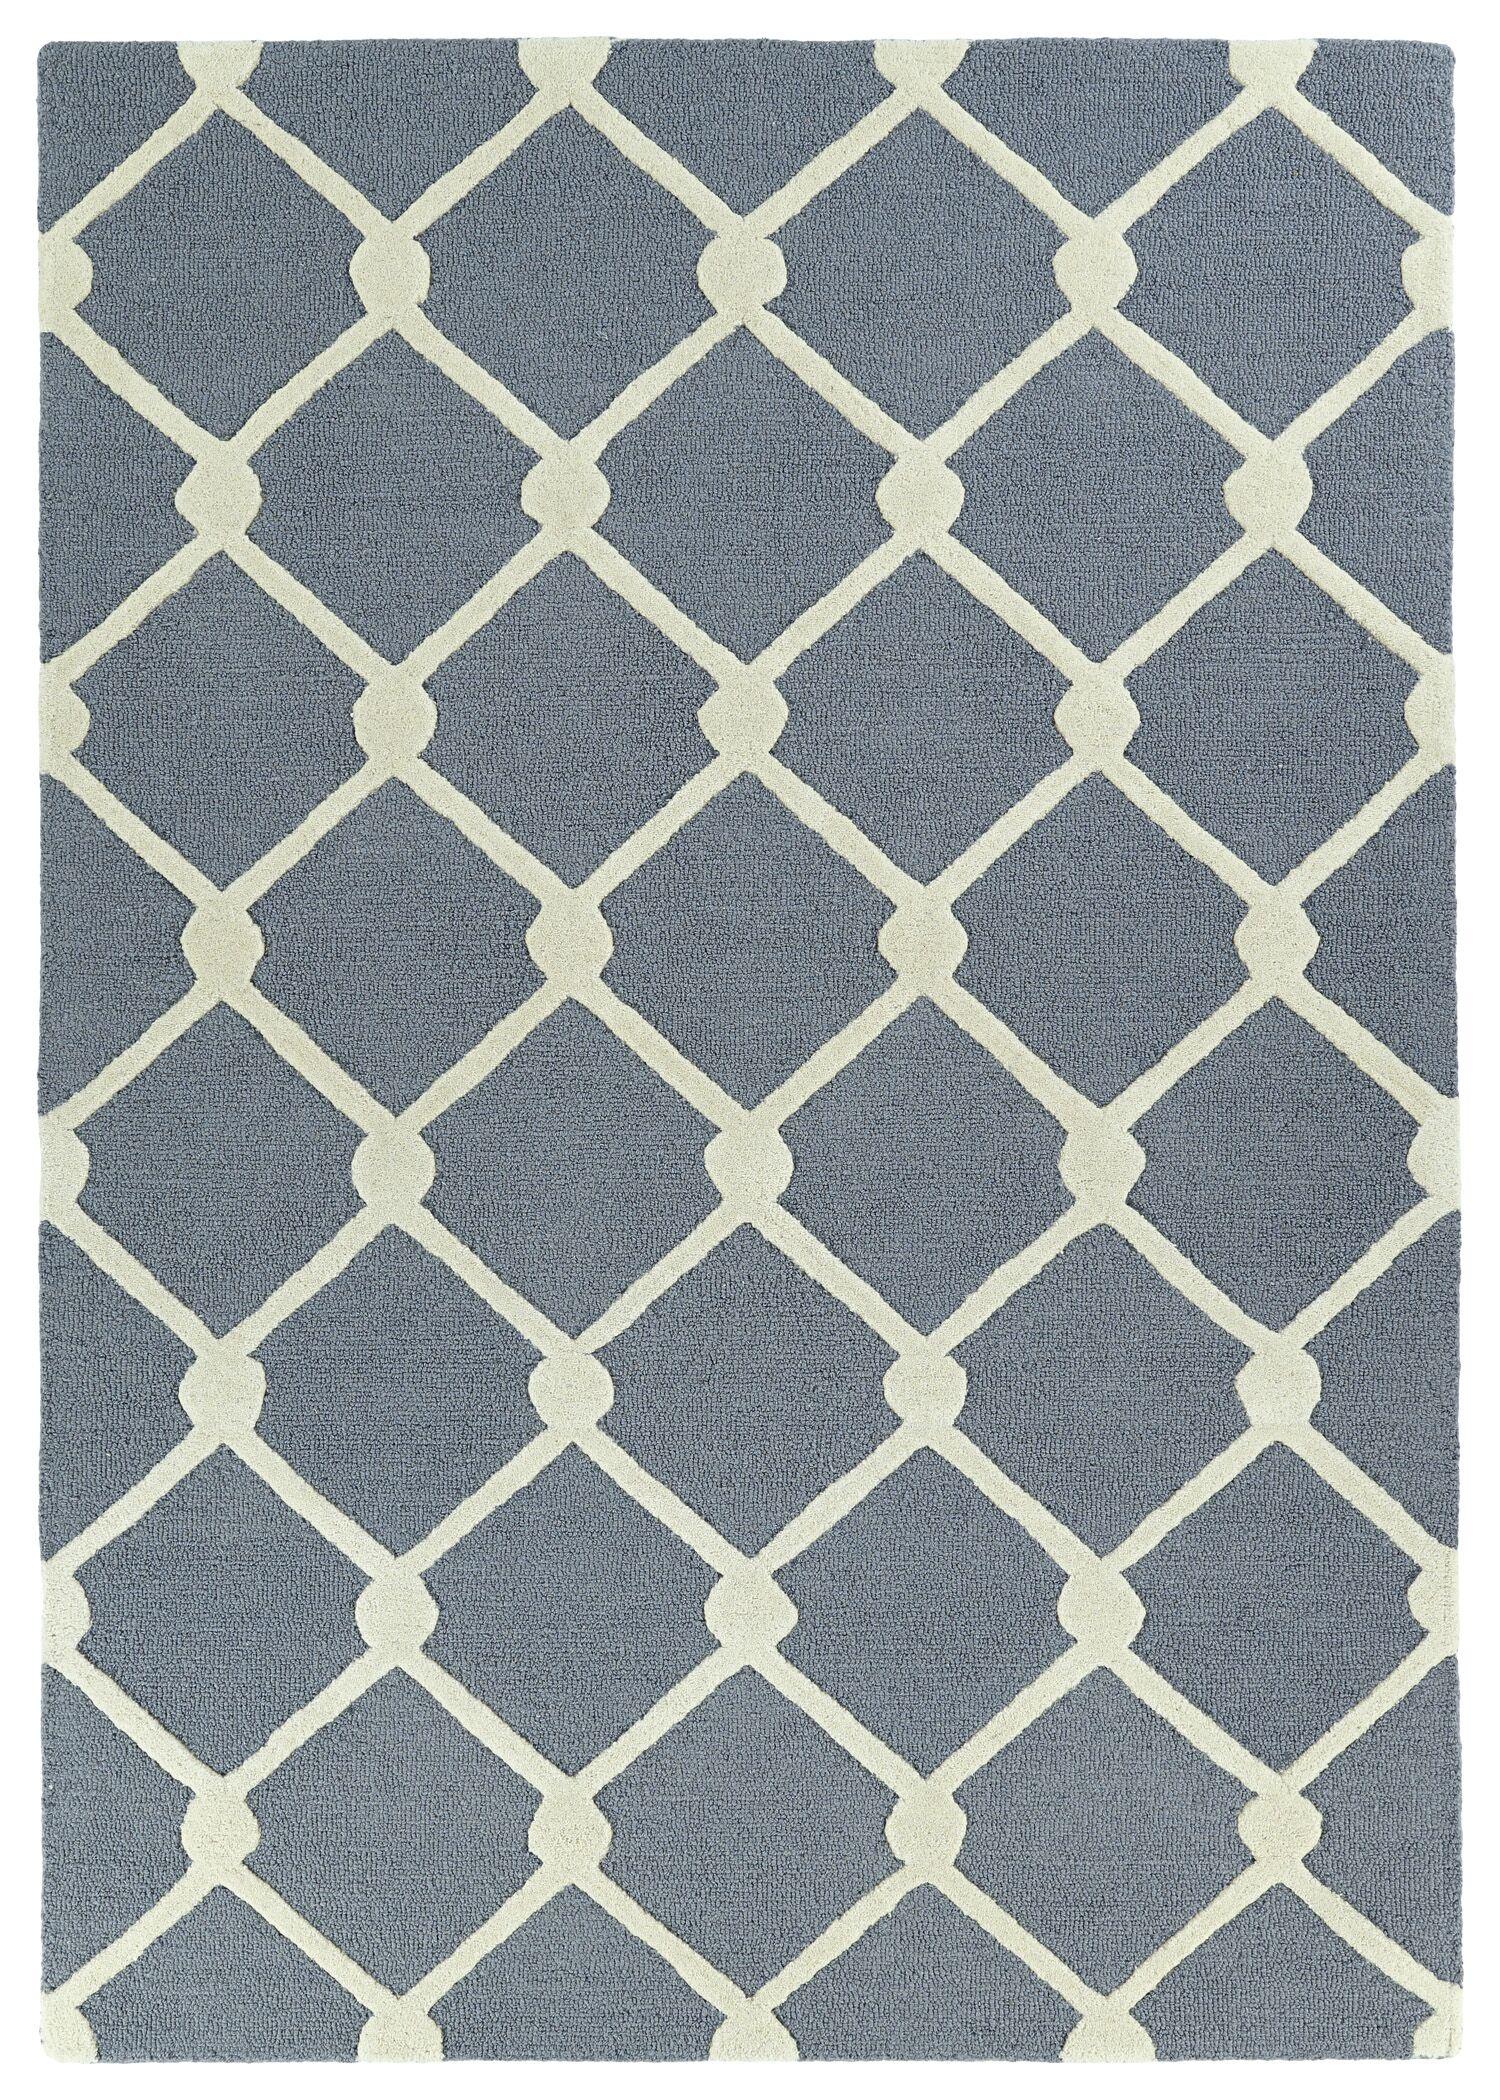 Cogar Handmade Gray Area Rug Rug Size: Rectangle 8' x 10'